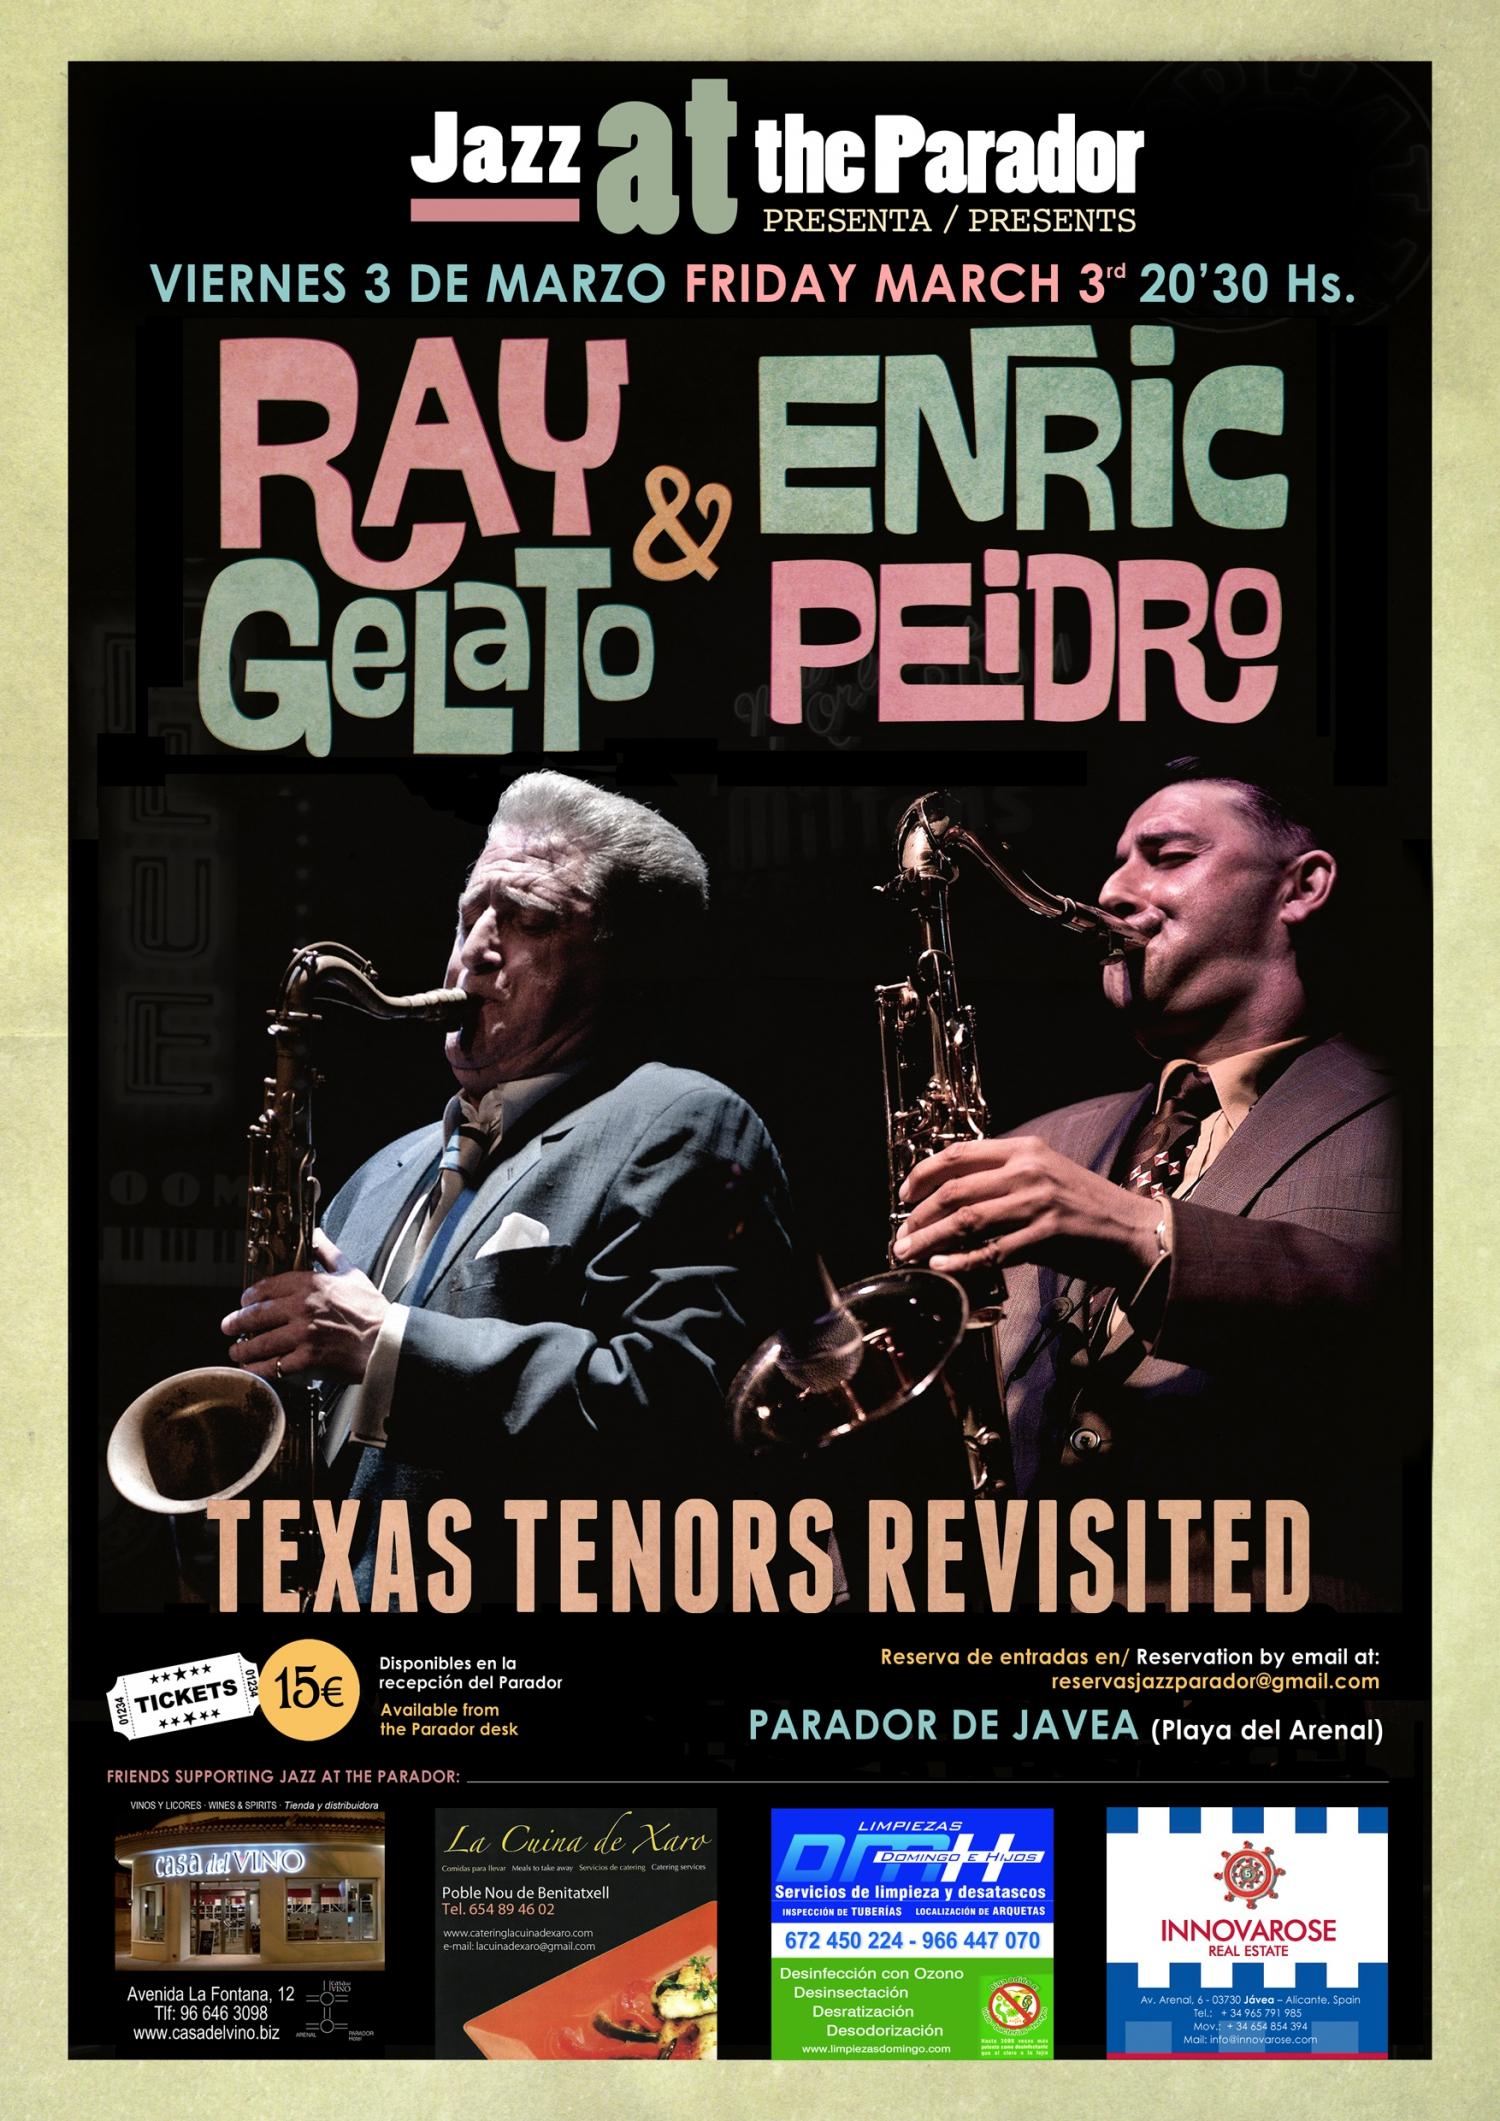 RAY GELATO & ENRIC PEIDRO 'Texas Tenors Revisited'